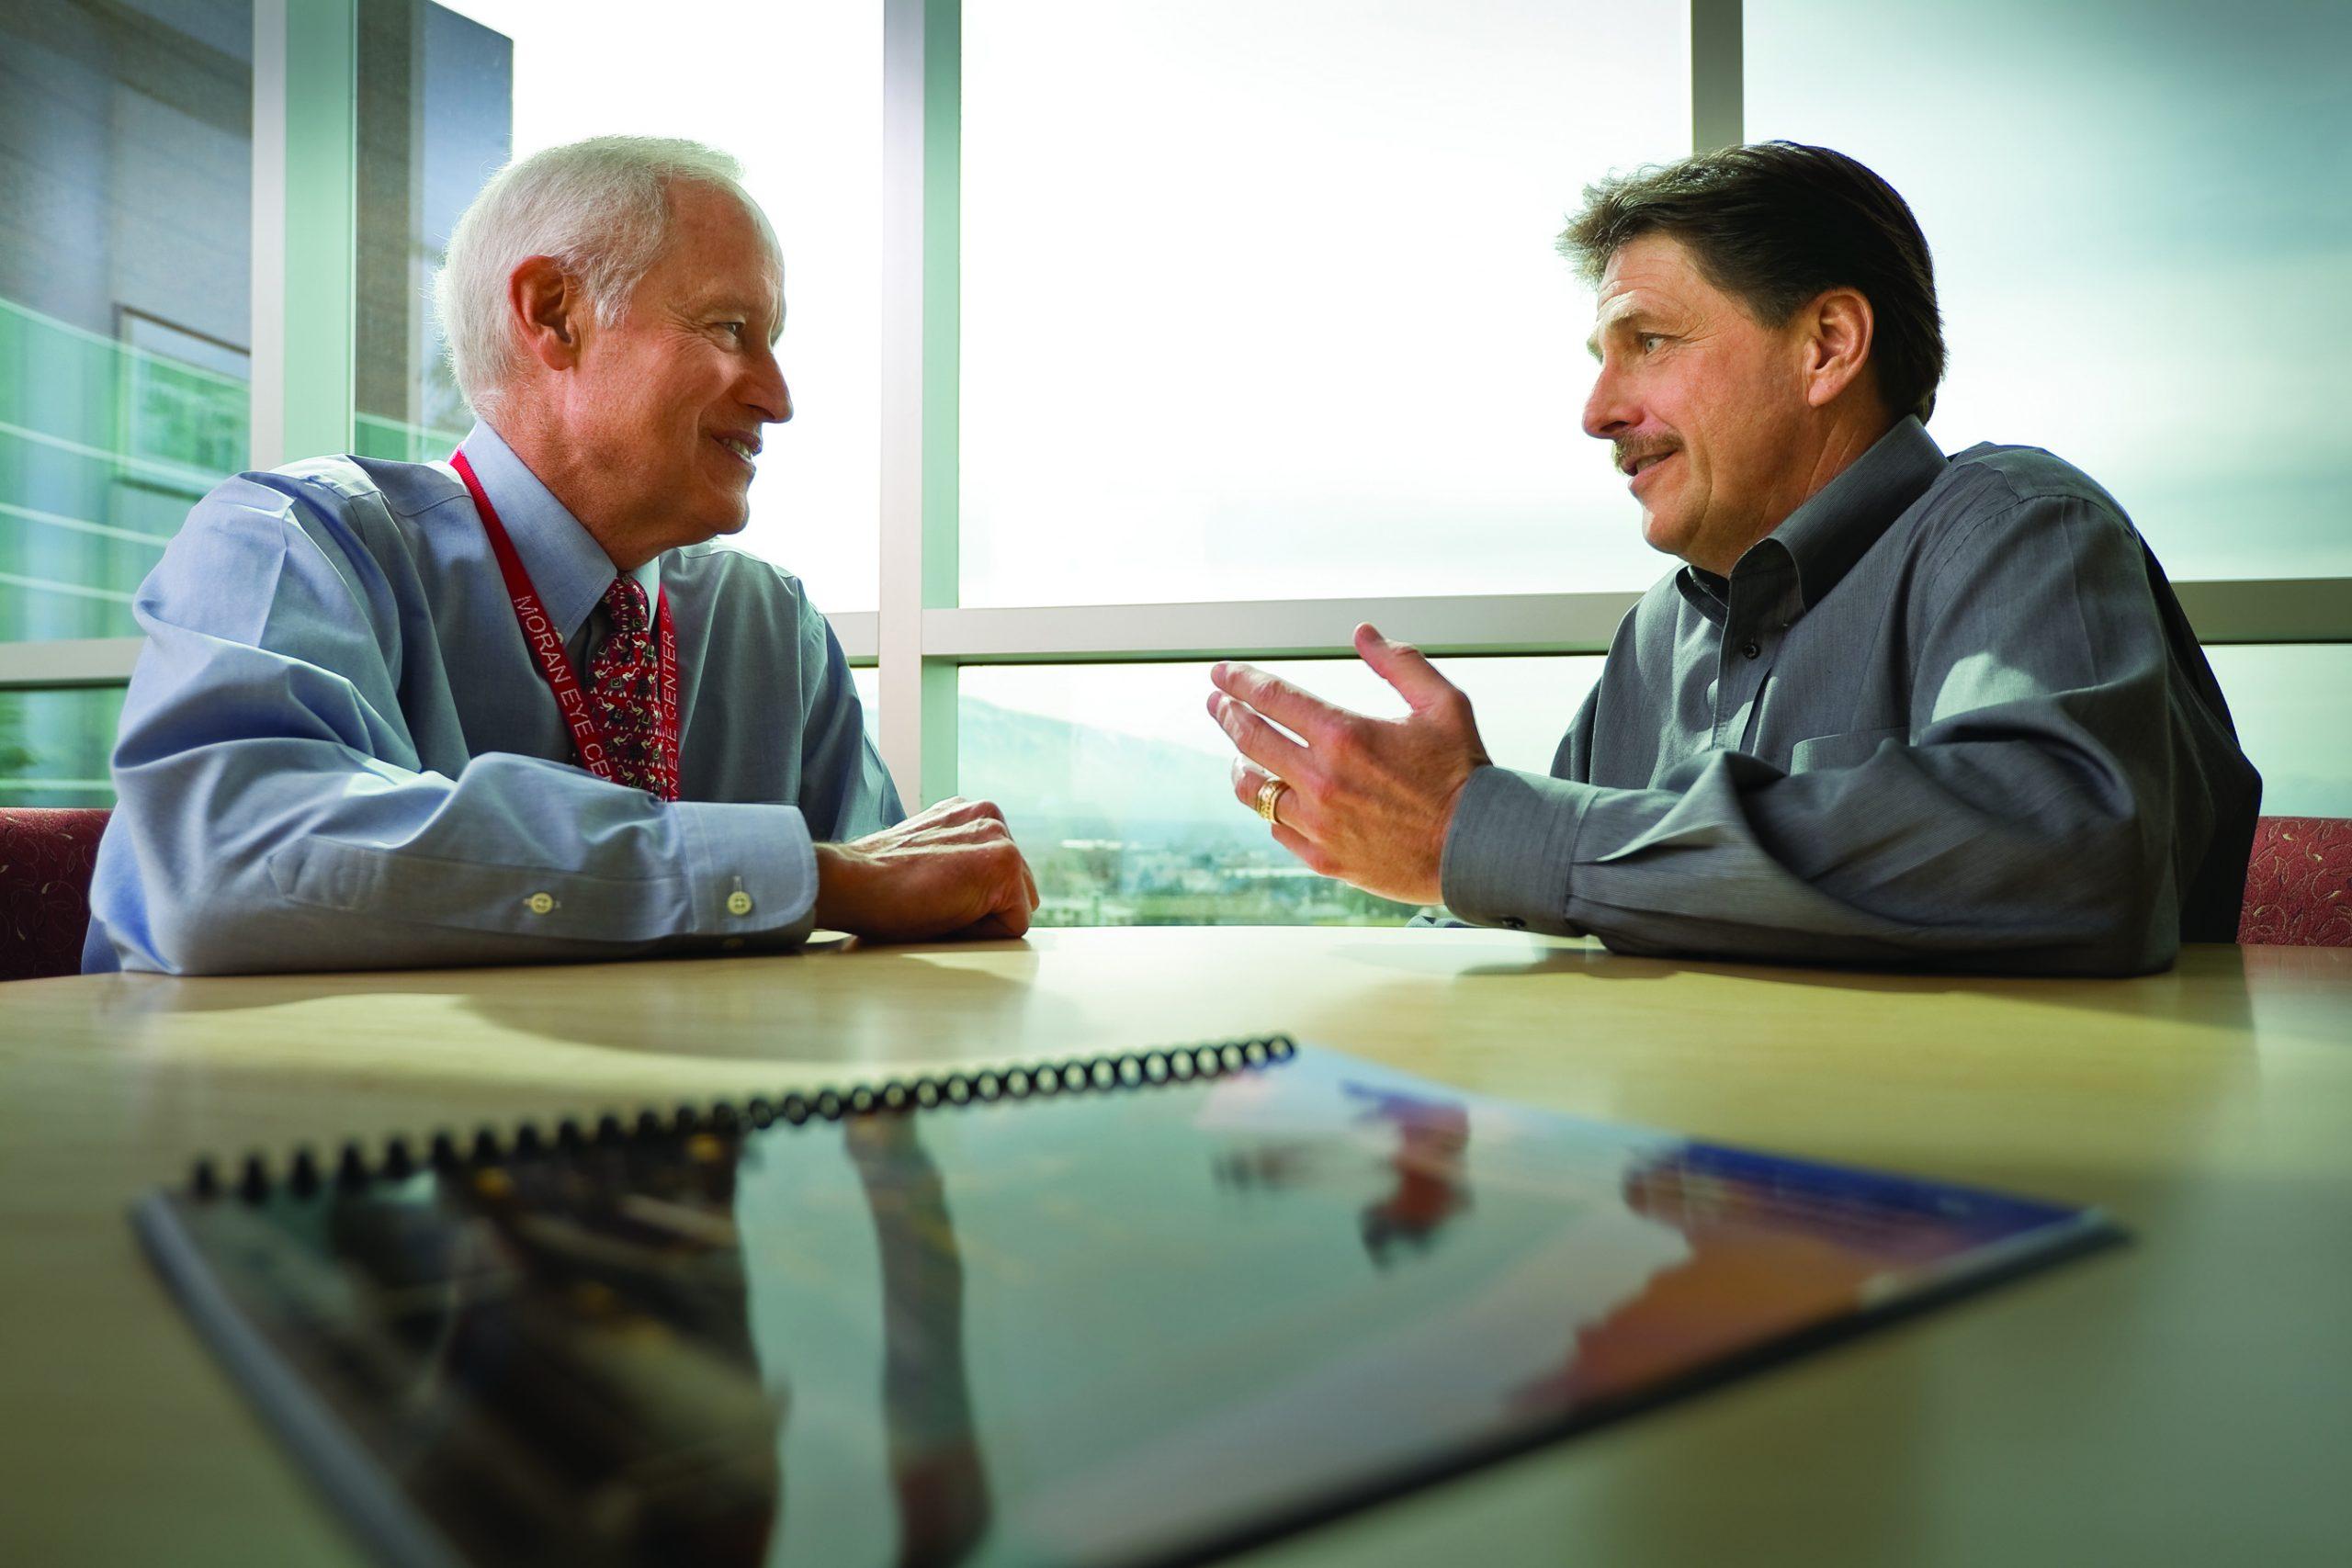 Randall J Olson, M.D., CEO of the John A. Moran Eye Center (left), And Gregory S. Hageman, Ph.D., Director of the Moran Center for Translational Medicine at the John A. Moran Eye Center (right).